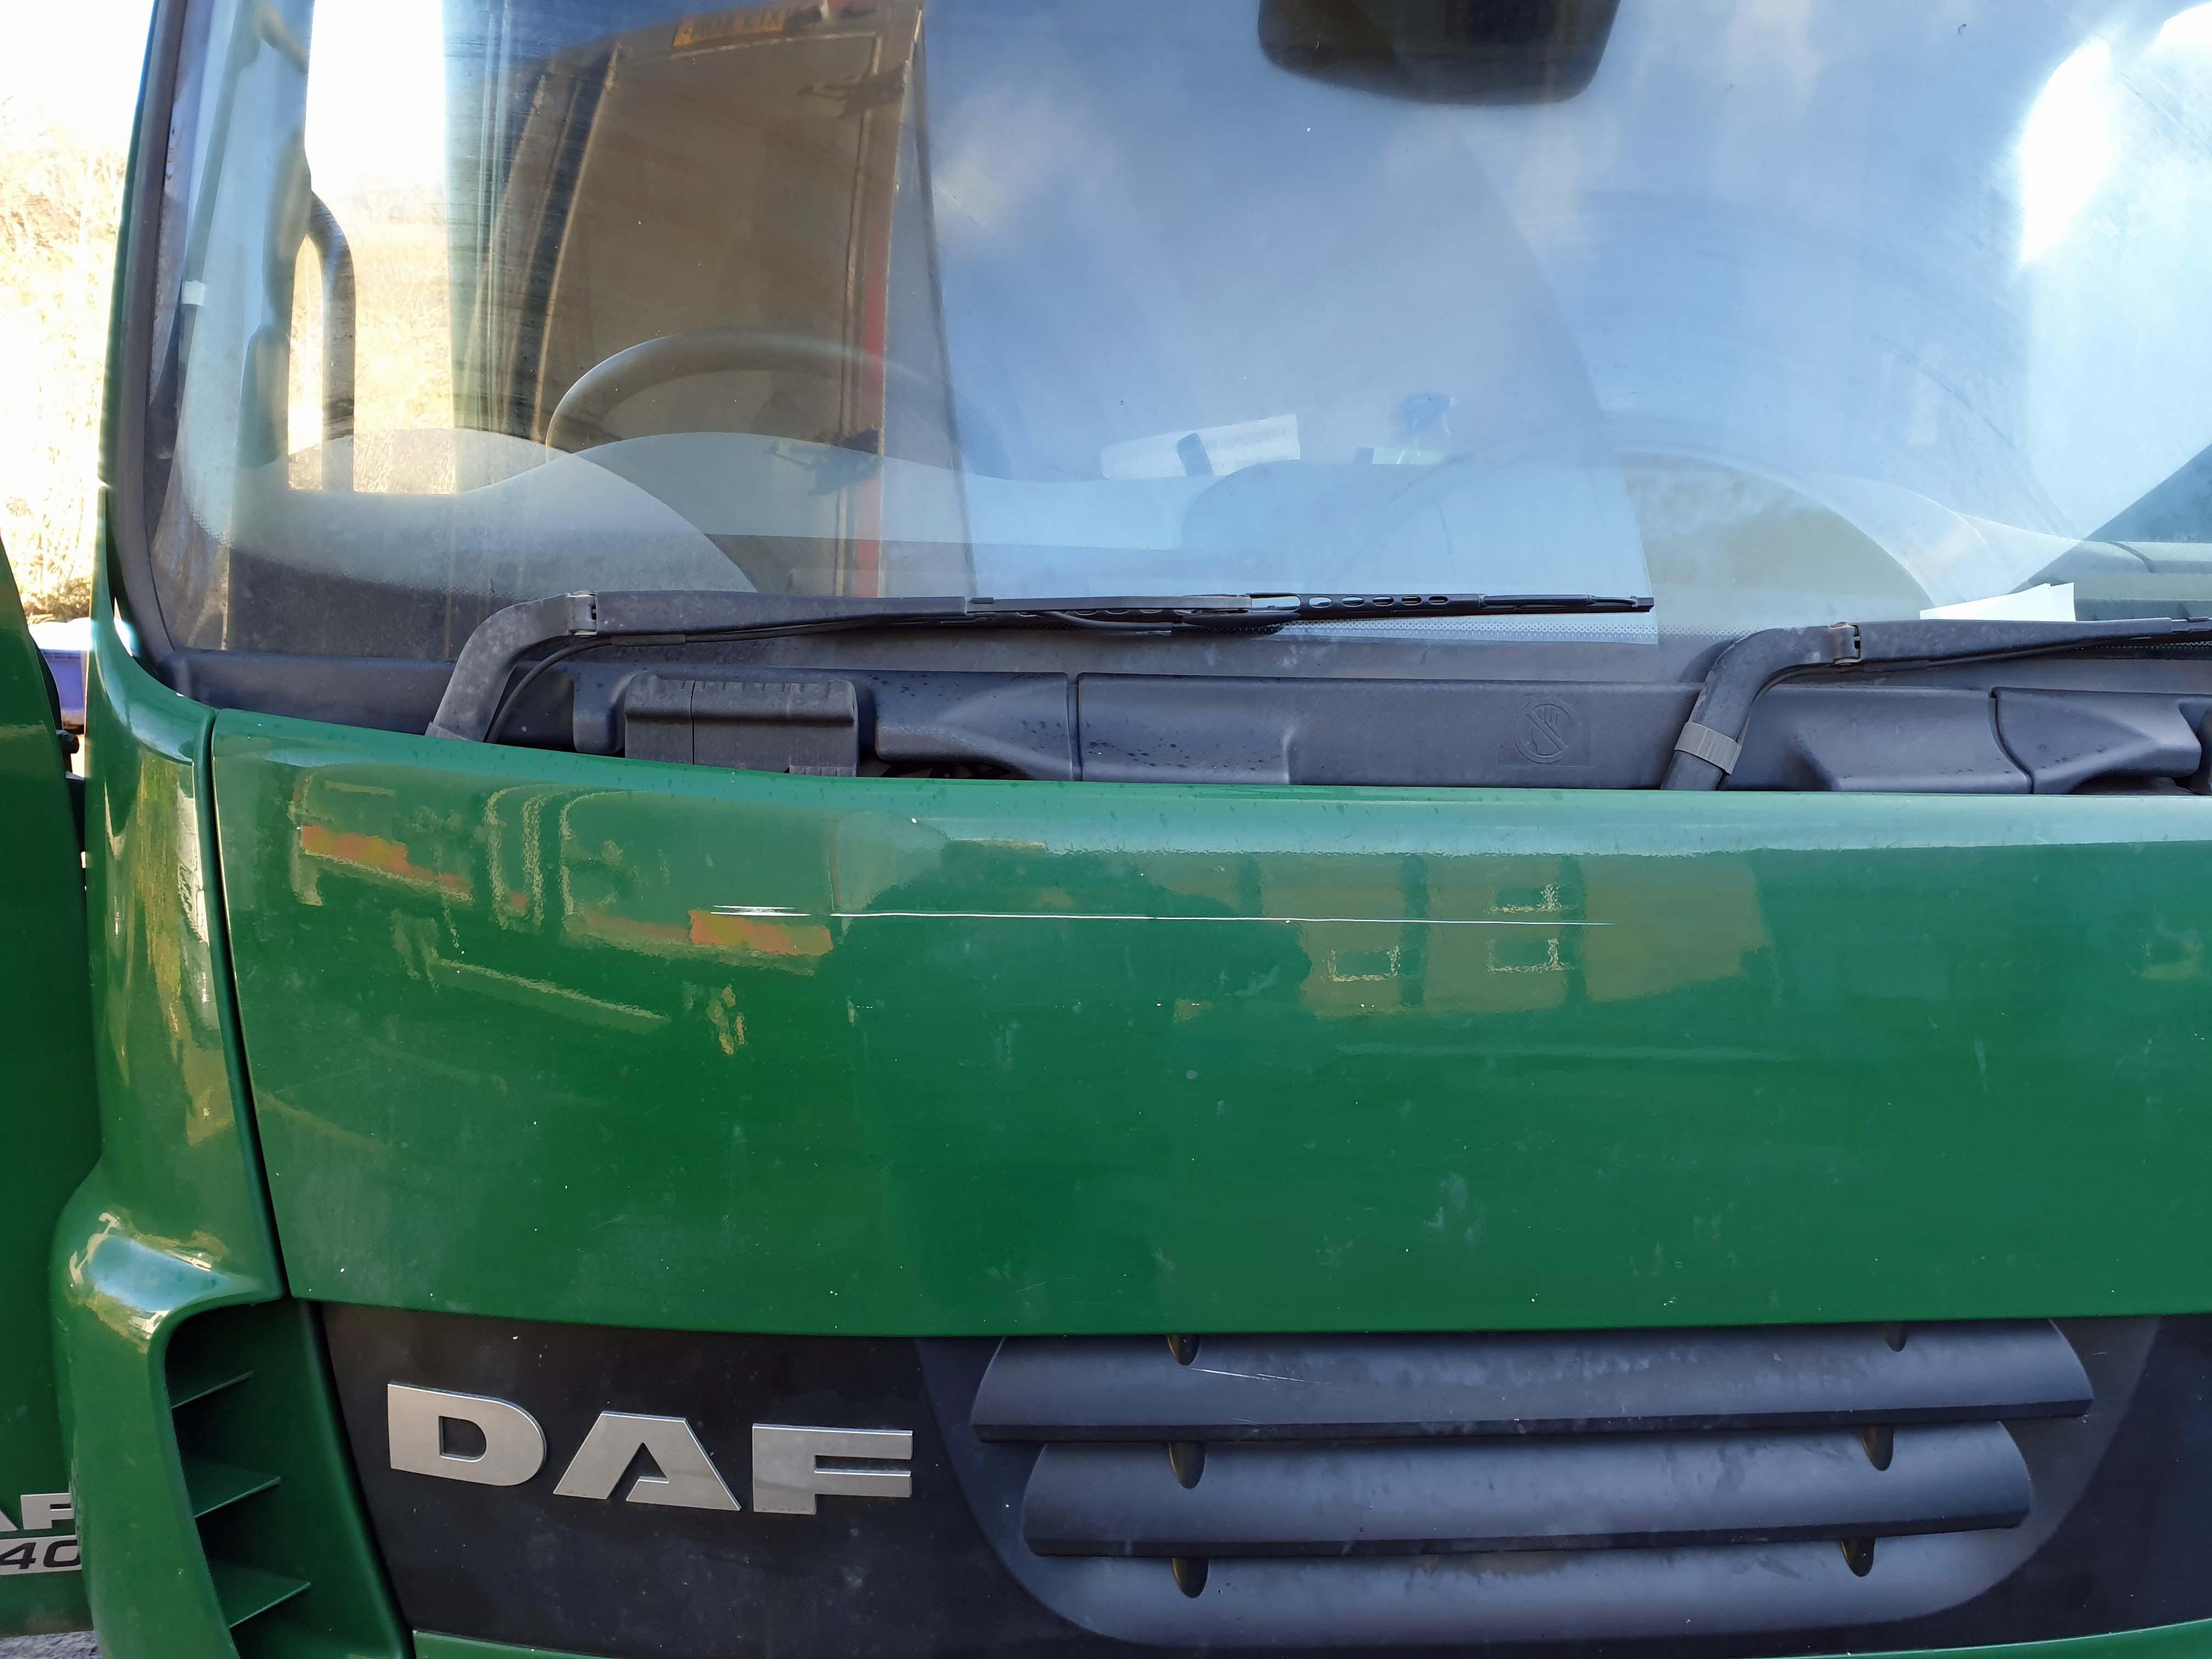 A DAF FA LF45.140 08 E 4461CC Euro4 4x2 7.5-Tonne Curtainside Truck, Registration No. RV59 FVA, - Image 11 of 11